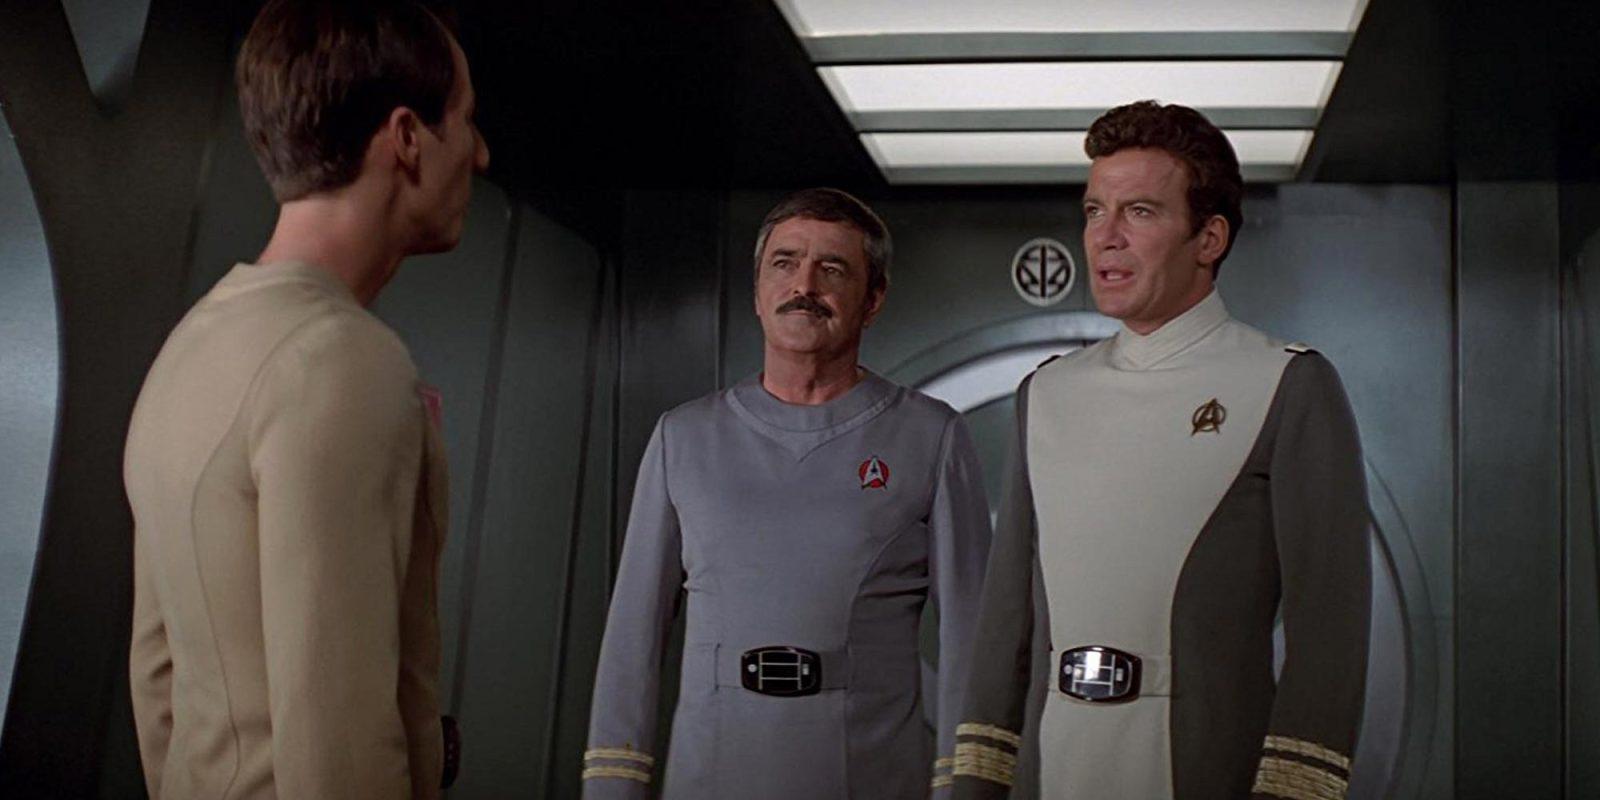 VUDU's bundle sale has Star Trek: 1-10, The Godfather Trilogy, Airplane 1 & 2, more